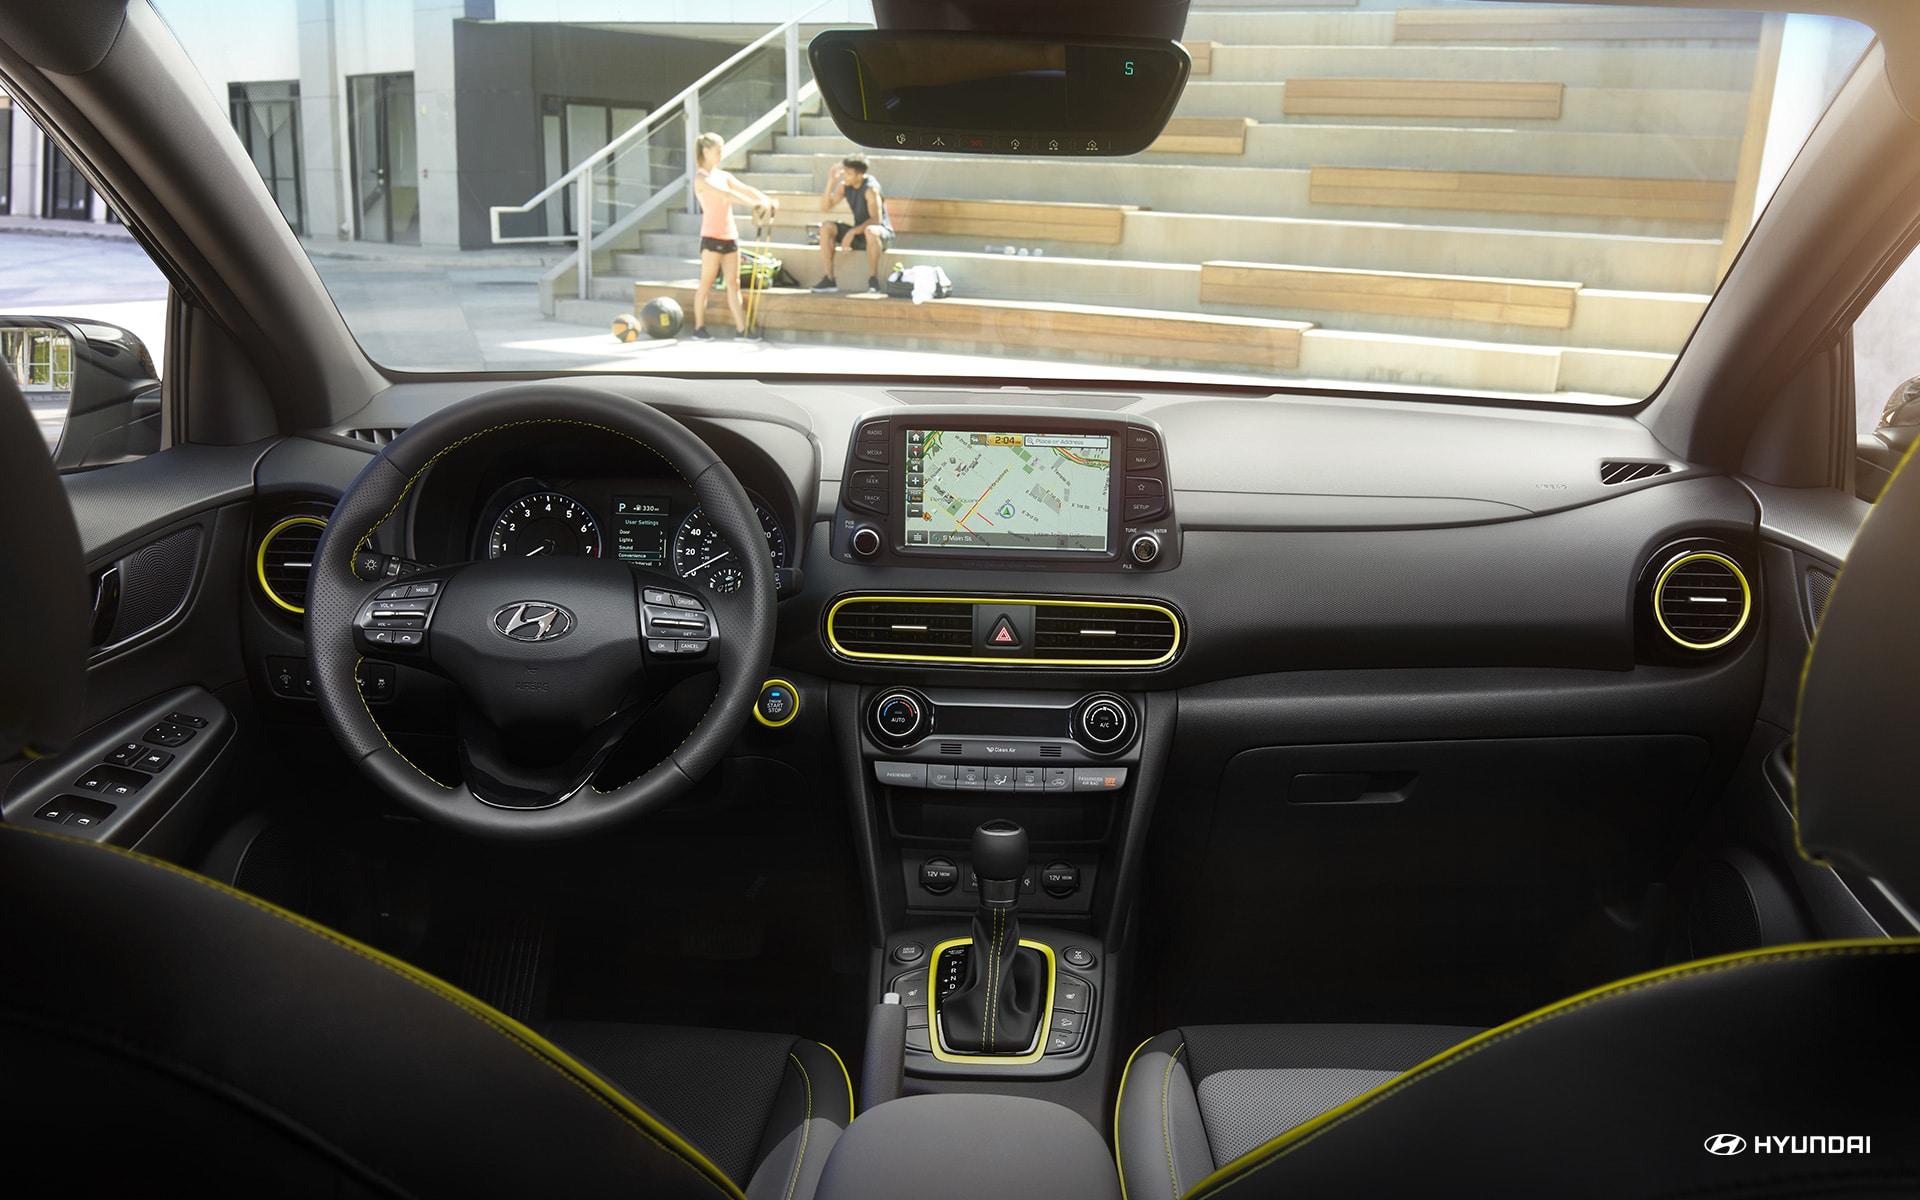 Step Inside the Hyundai Kona!